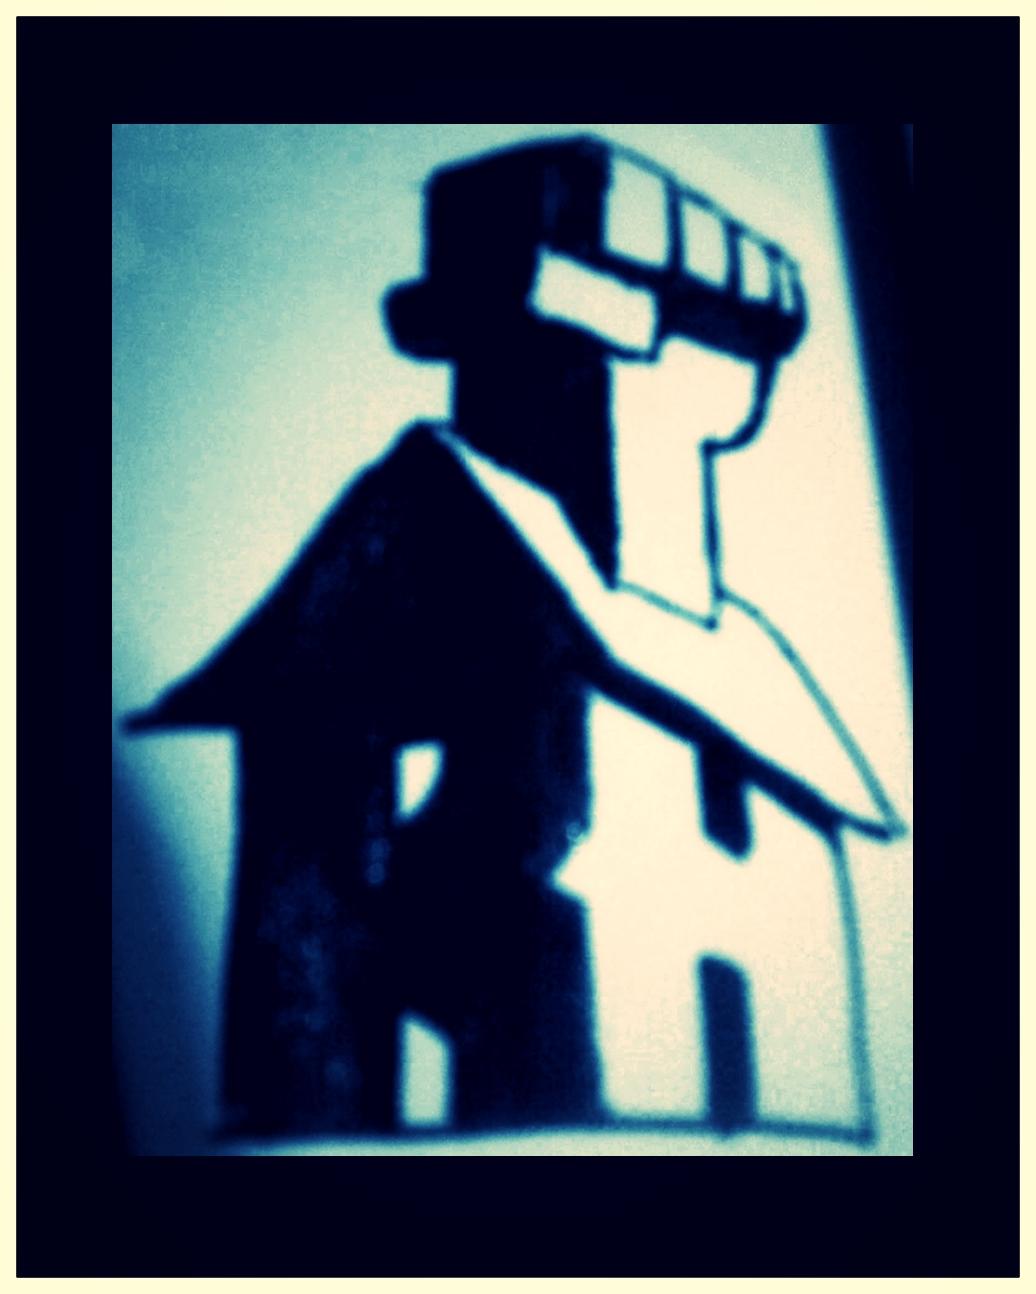 THE FIRST ROUGH HOUSE PUBLISHING LOGO SKETCH. DECEMBER 2011. BRICK & MORTAR INCARNATE!